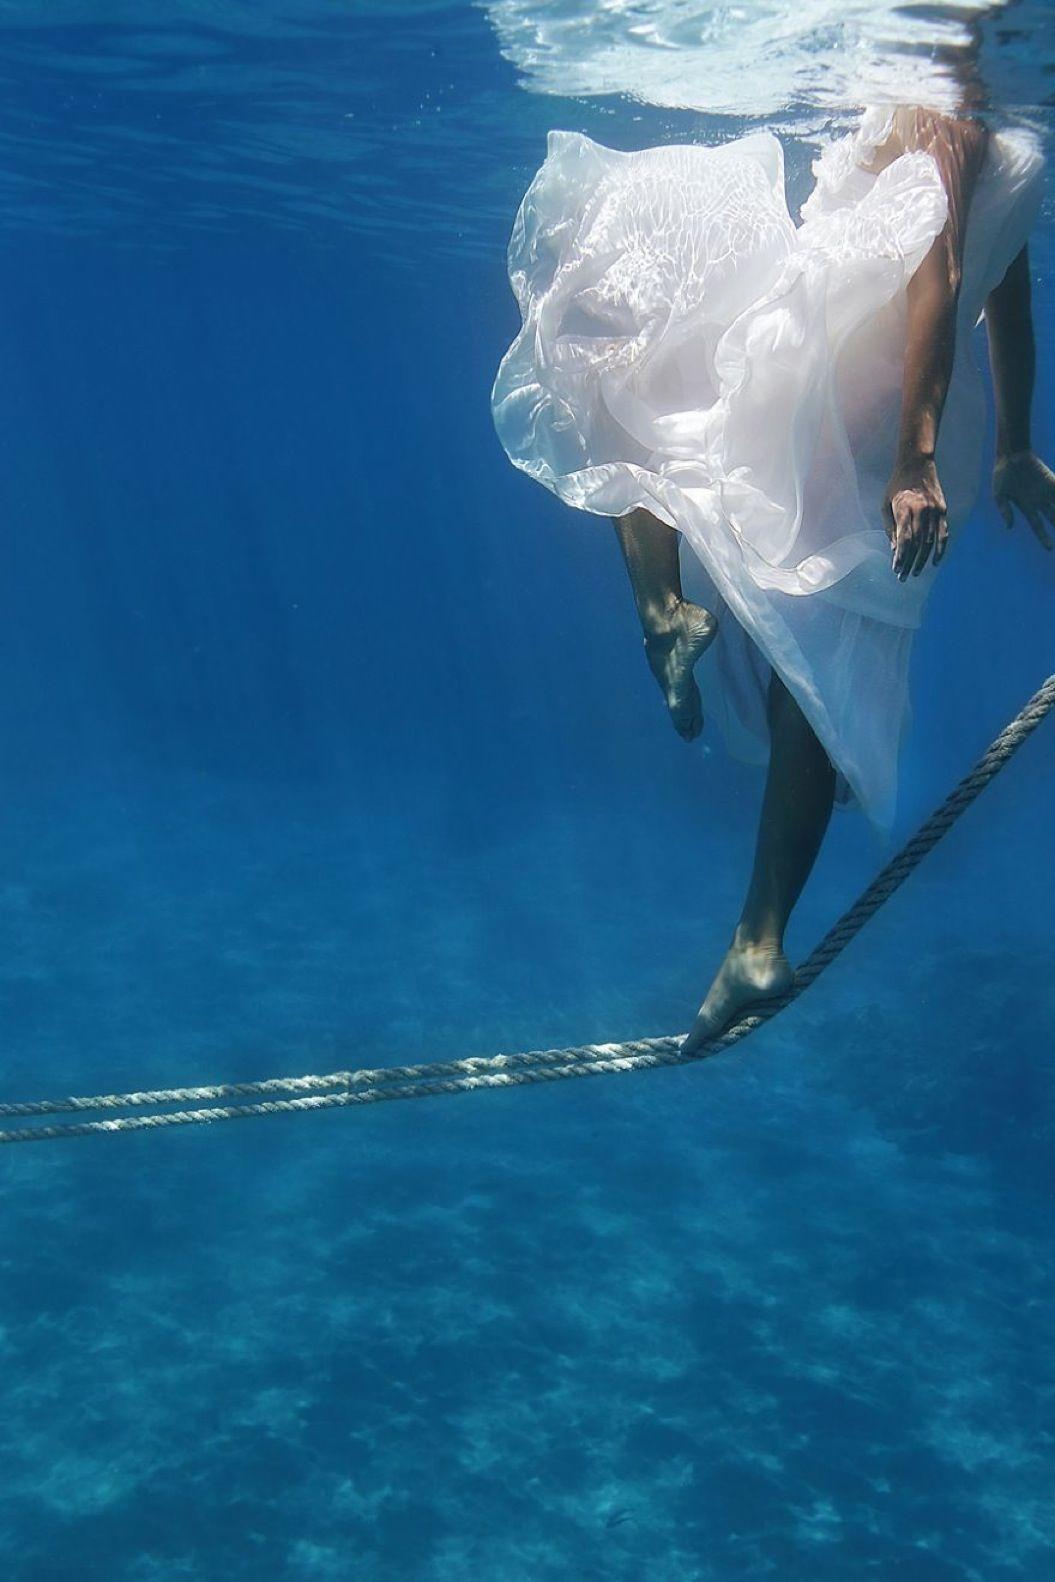 85singo_Underwater-Trash-the-Dress-Shoot-Maui9__880